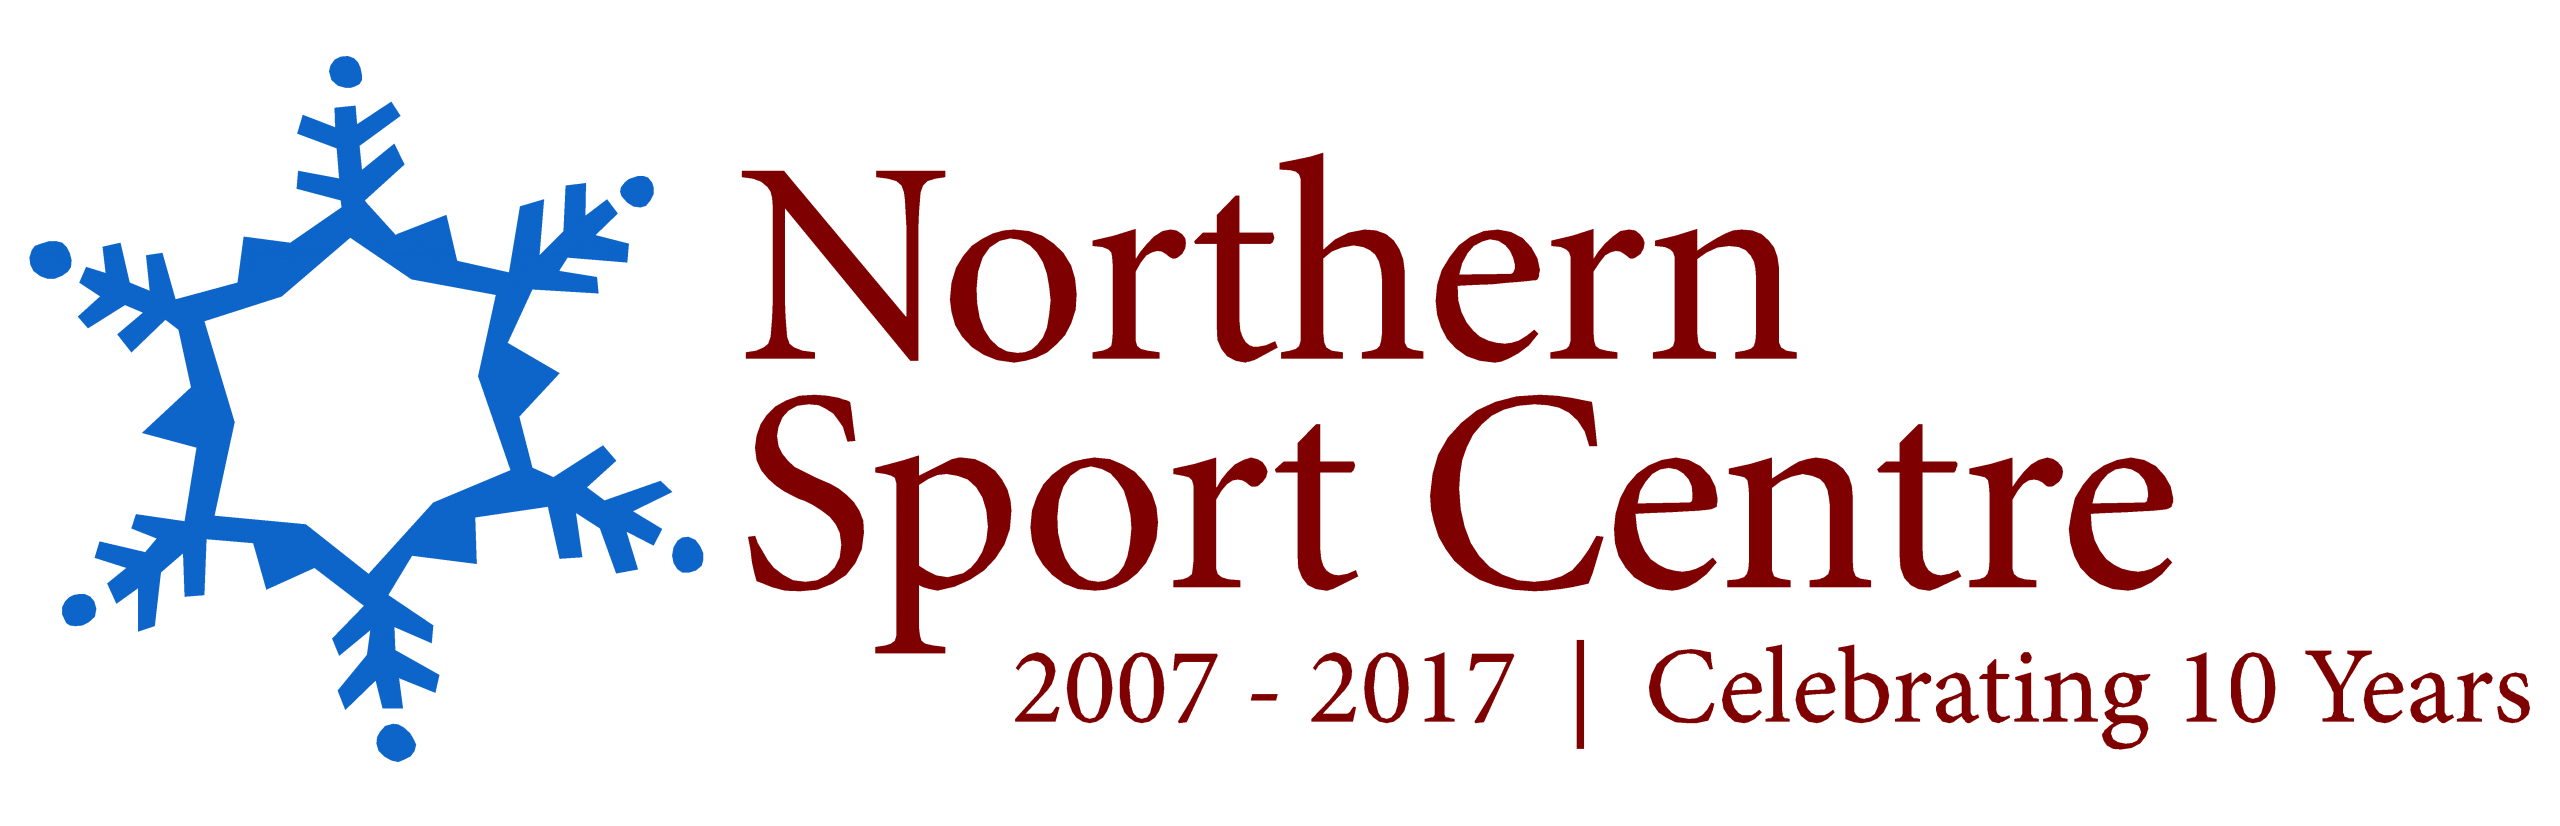 Northern Sport Centre's 10th Anniversary